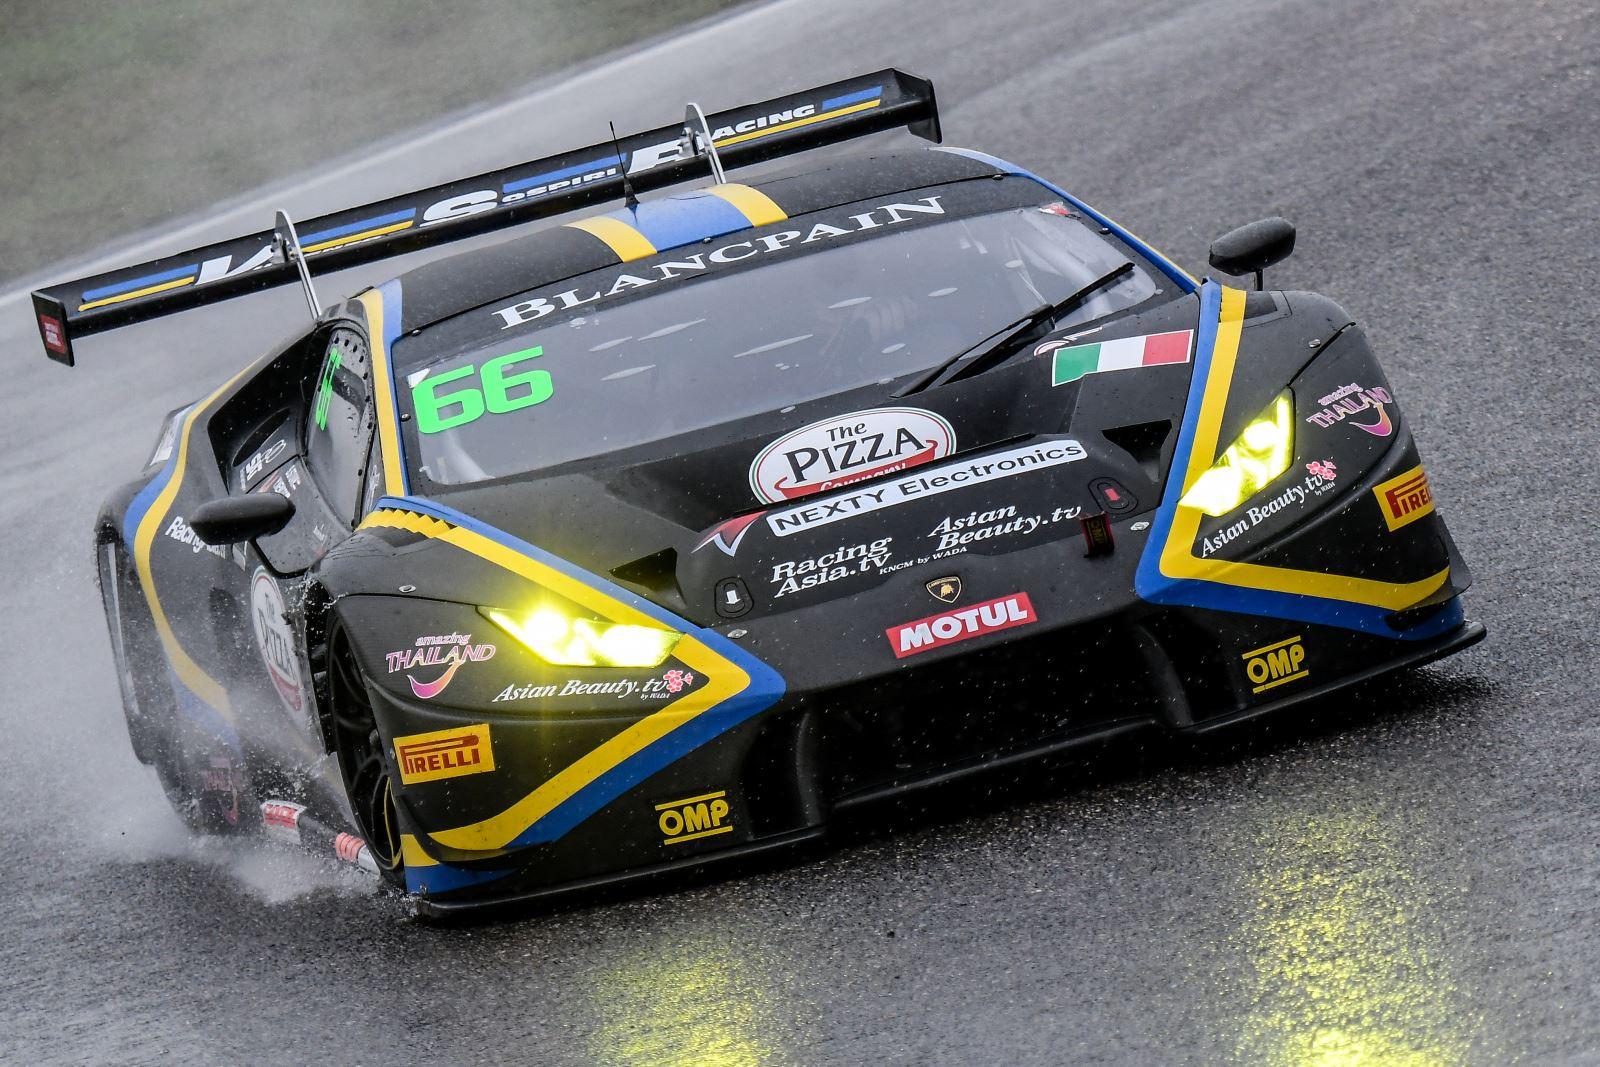 Vsr Make 2019 Return With Lamborghini Huracan Gt3 Evo Endurance